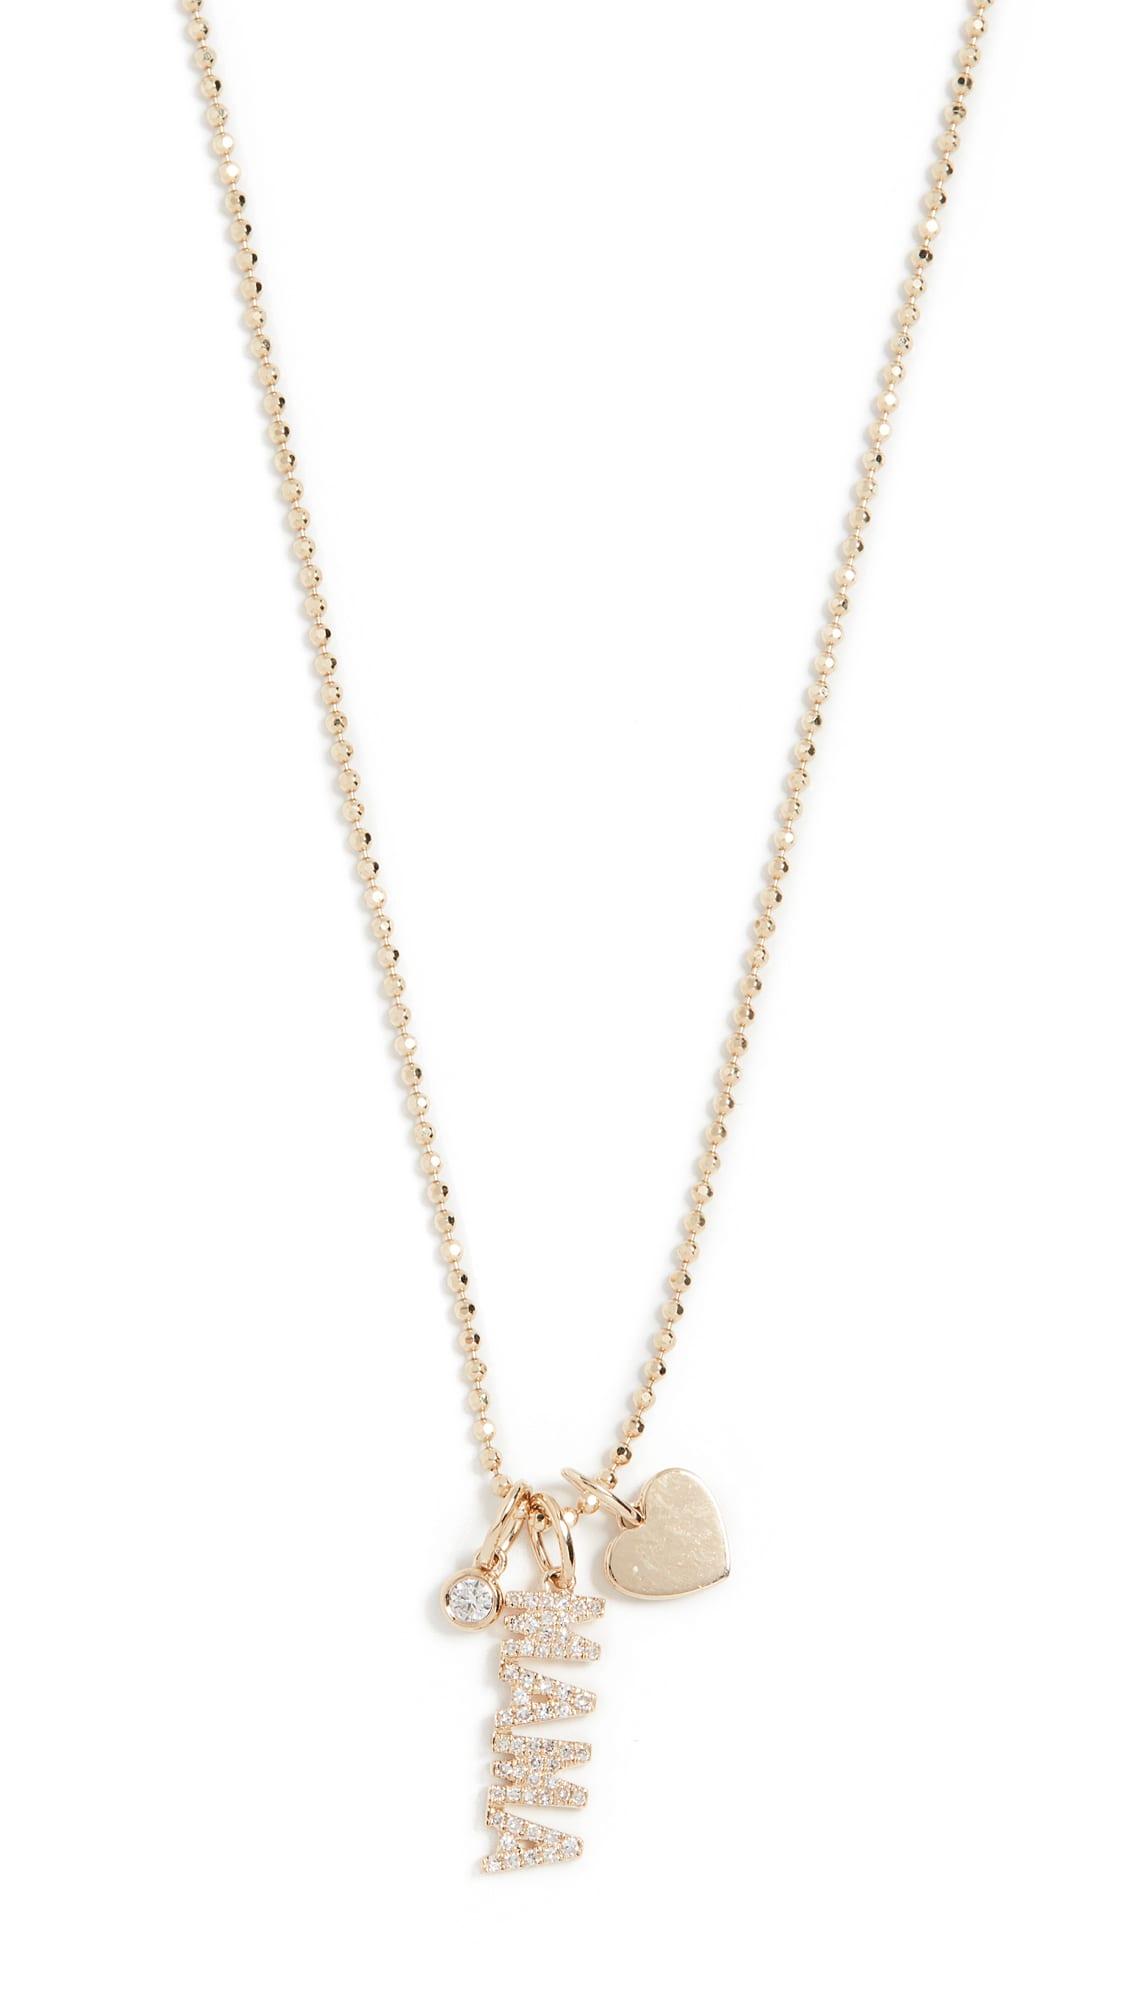 shopbop EF Collection 14k Diamond Mama Charm Necklace